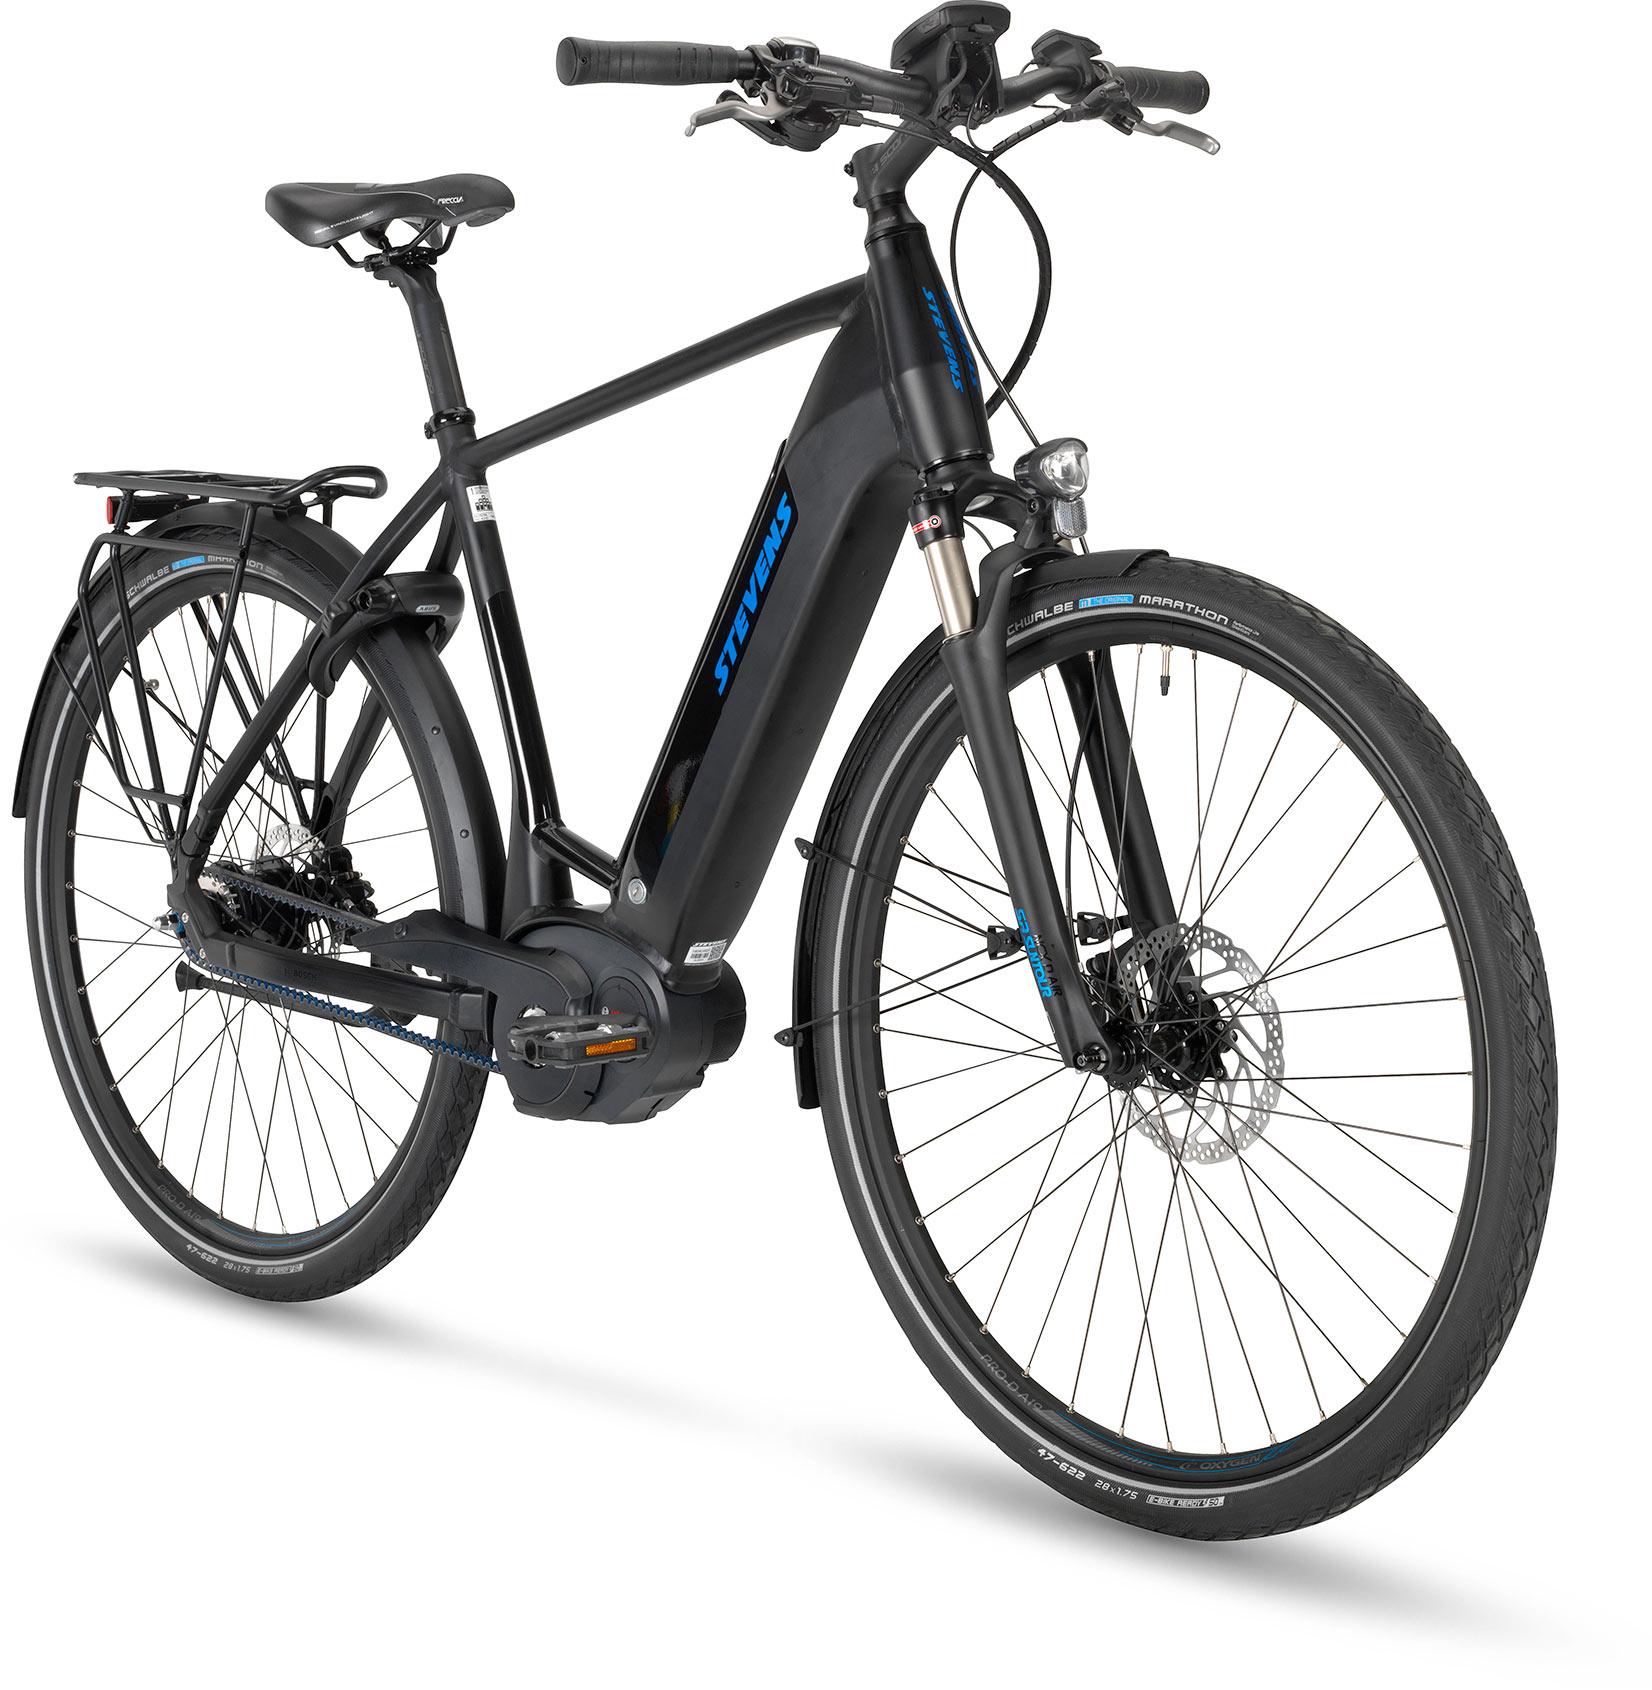 e courier luxe gent stevens bikes 2018. Black Bedroom Furniture Sets. Home Design Ideas